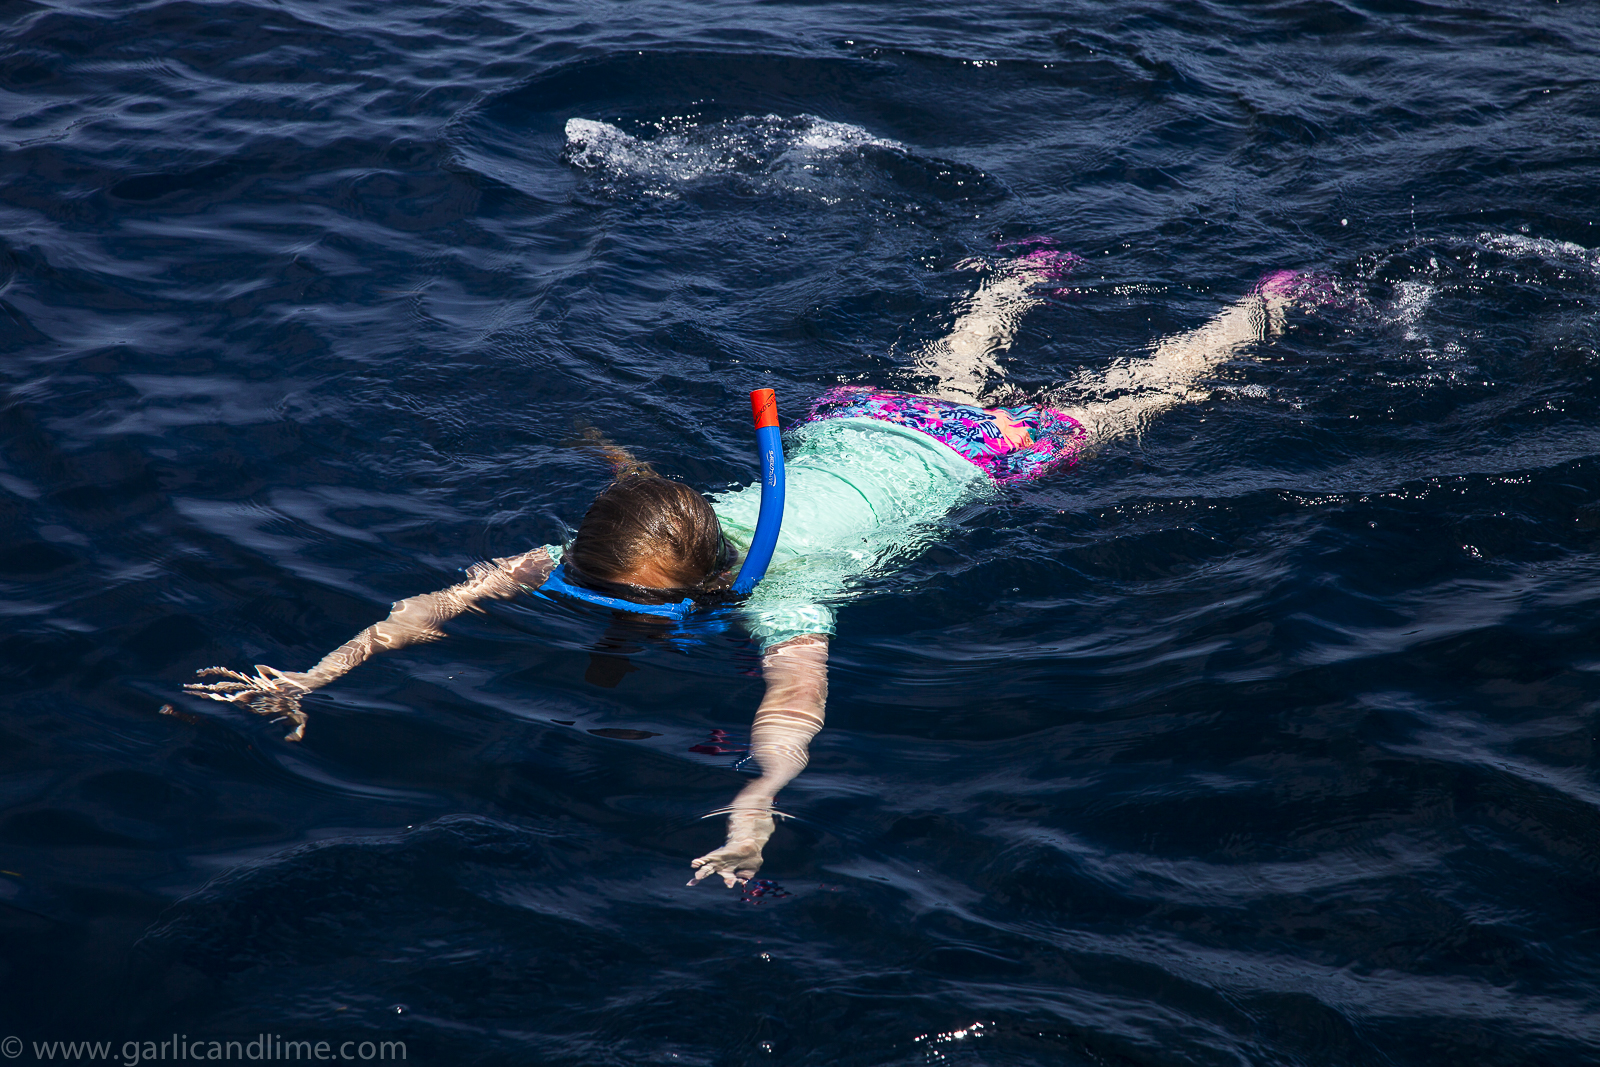 Lois snorkeling, Pulau Bunaken, Sulawesi, Indonesia